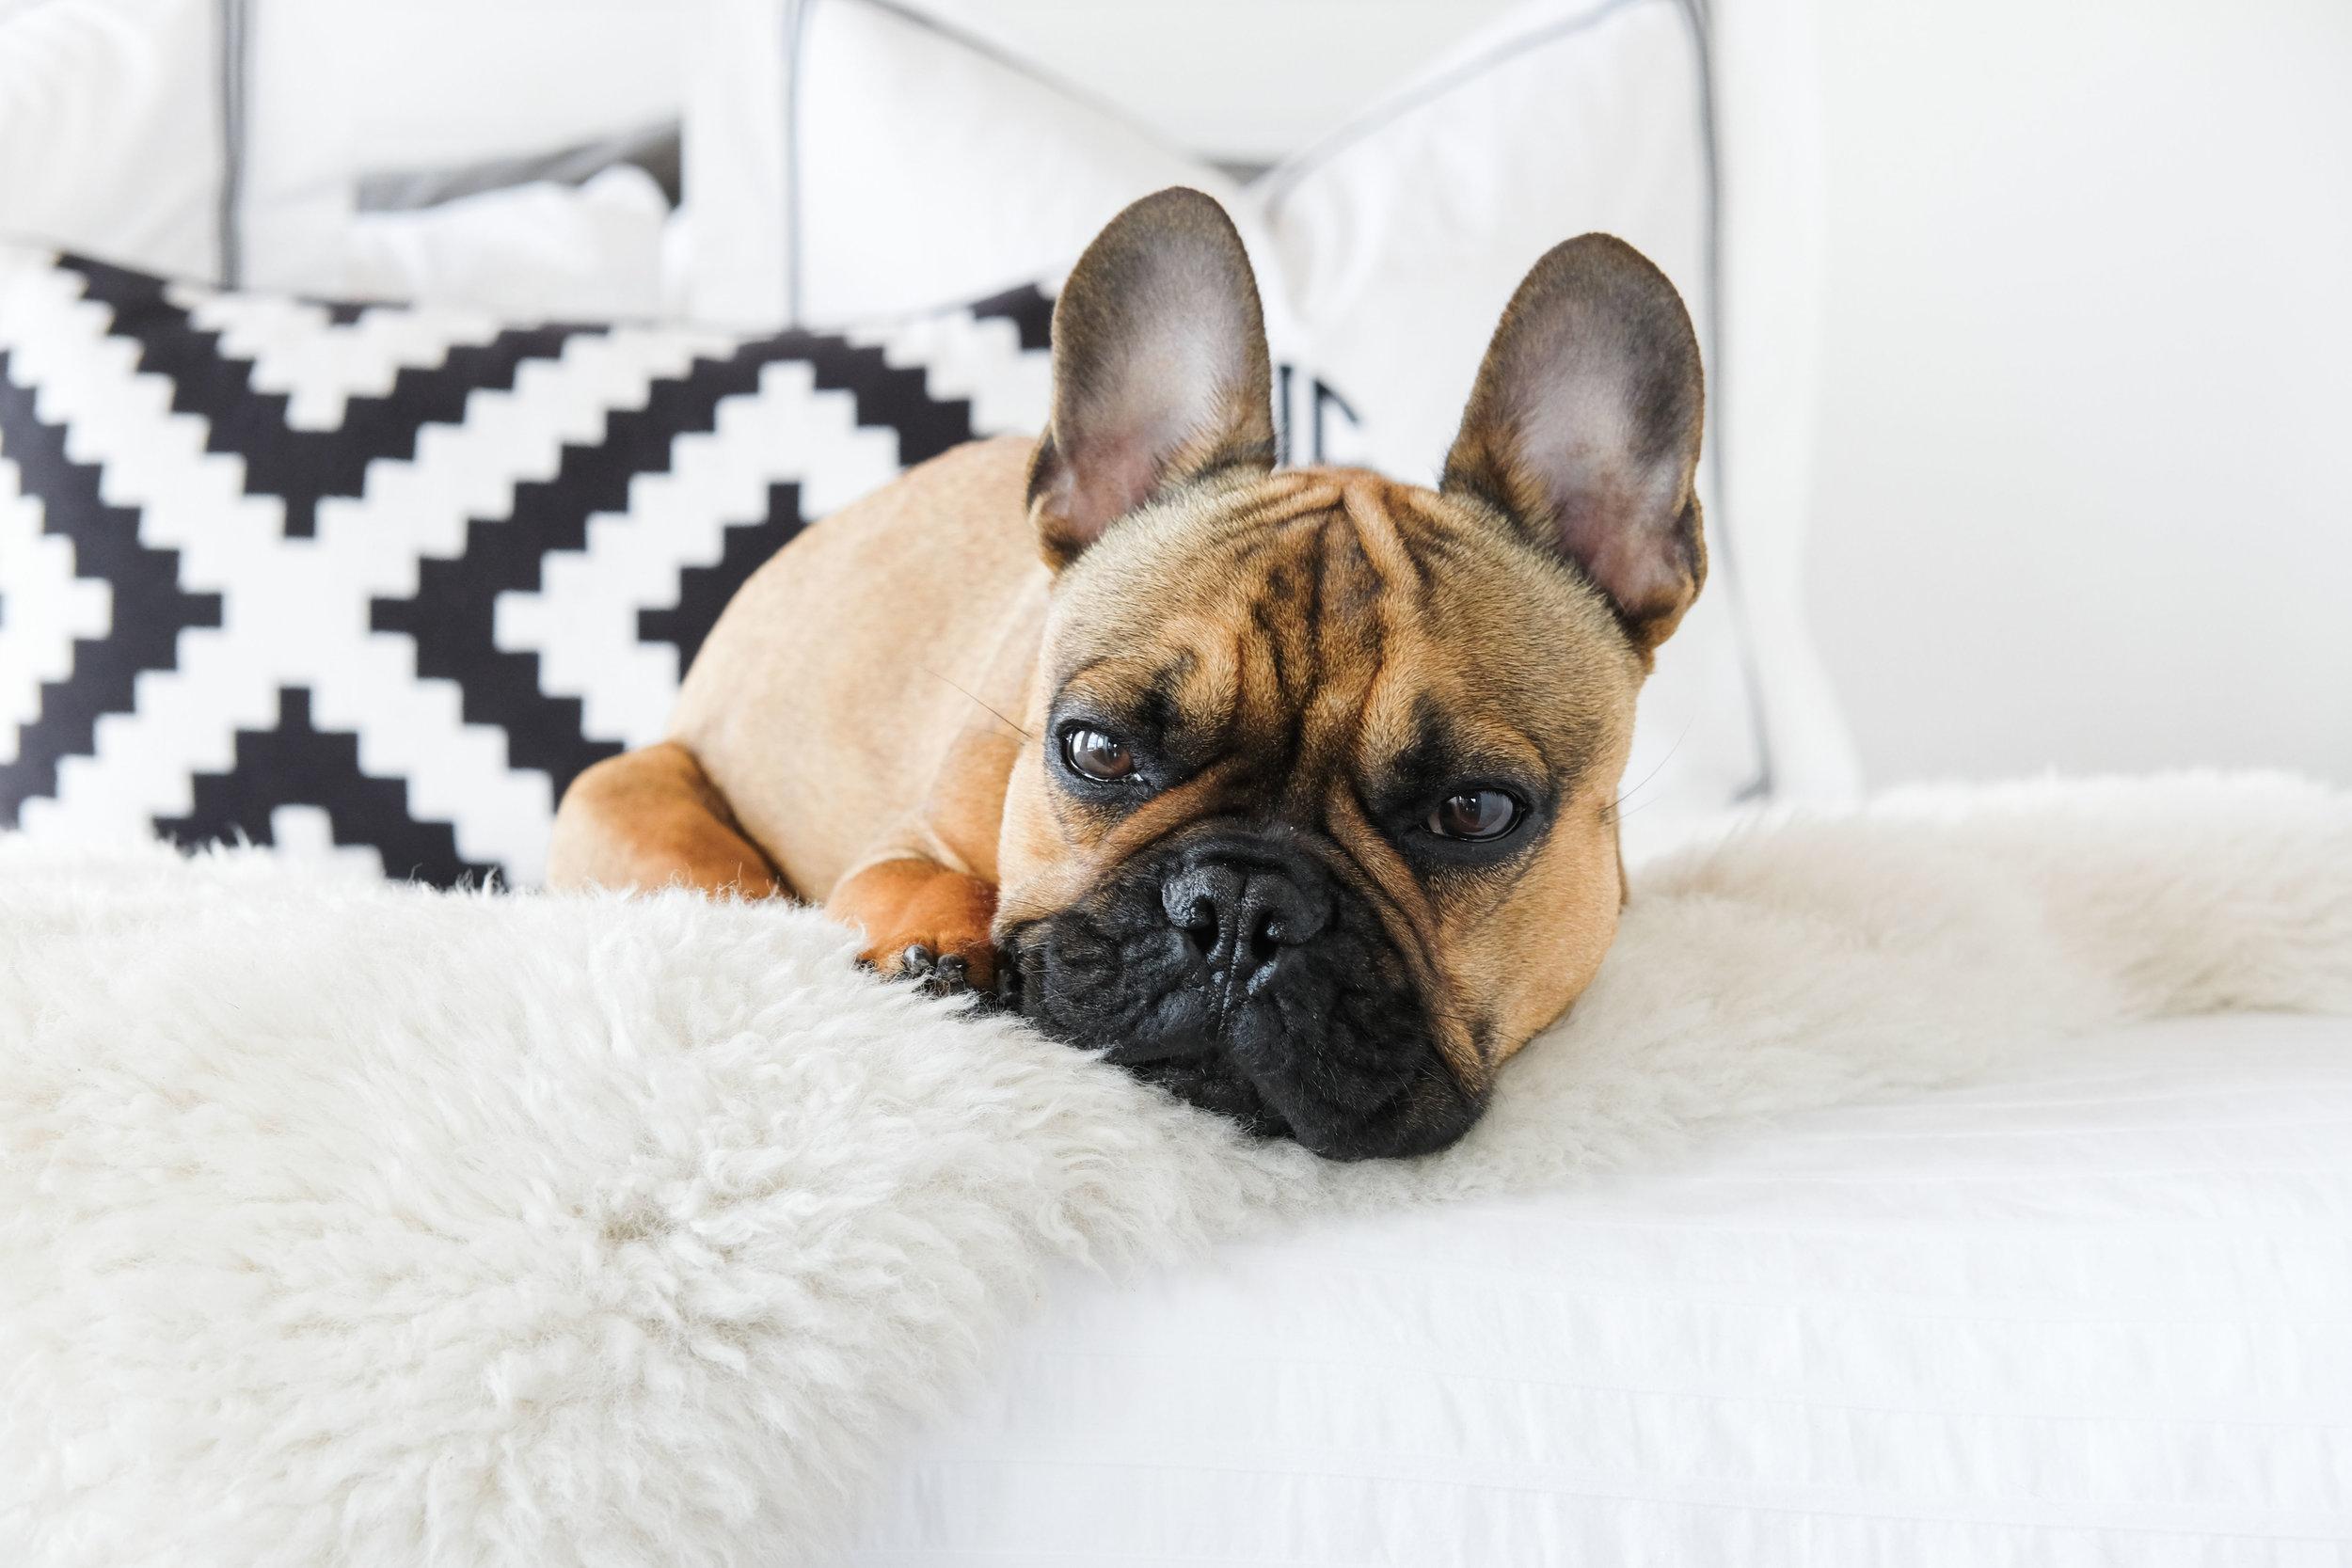 diy custom bedskirt no sew_pottery barn grand embroidered shams_all white master bedroom_industrial loft decor_french bulldog puppy_01.jpg